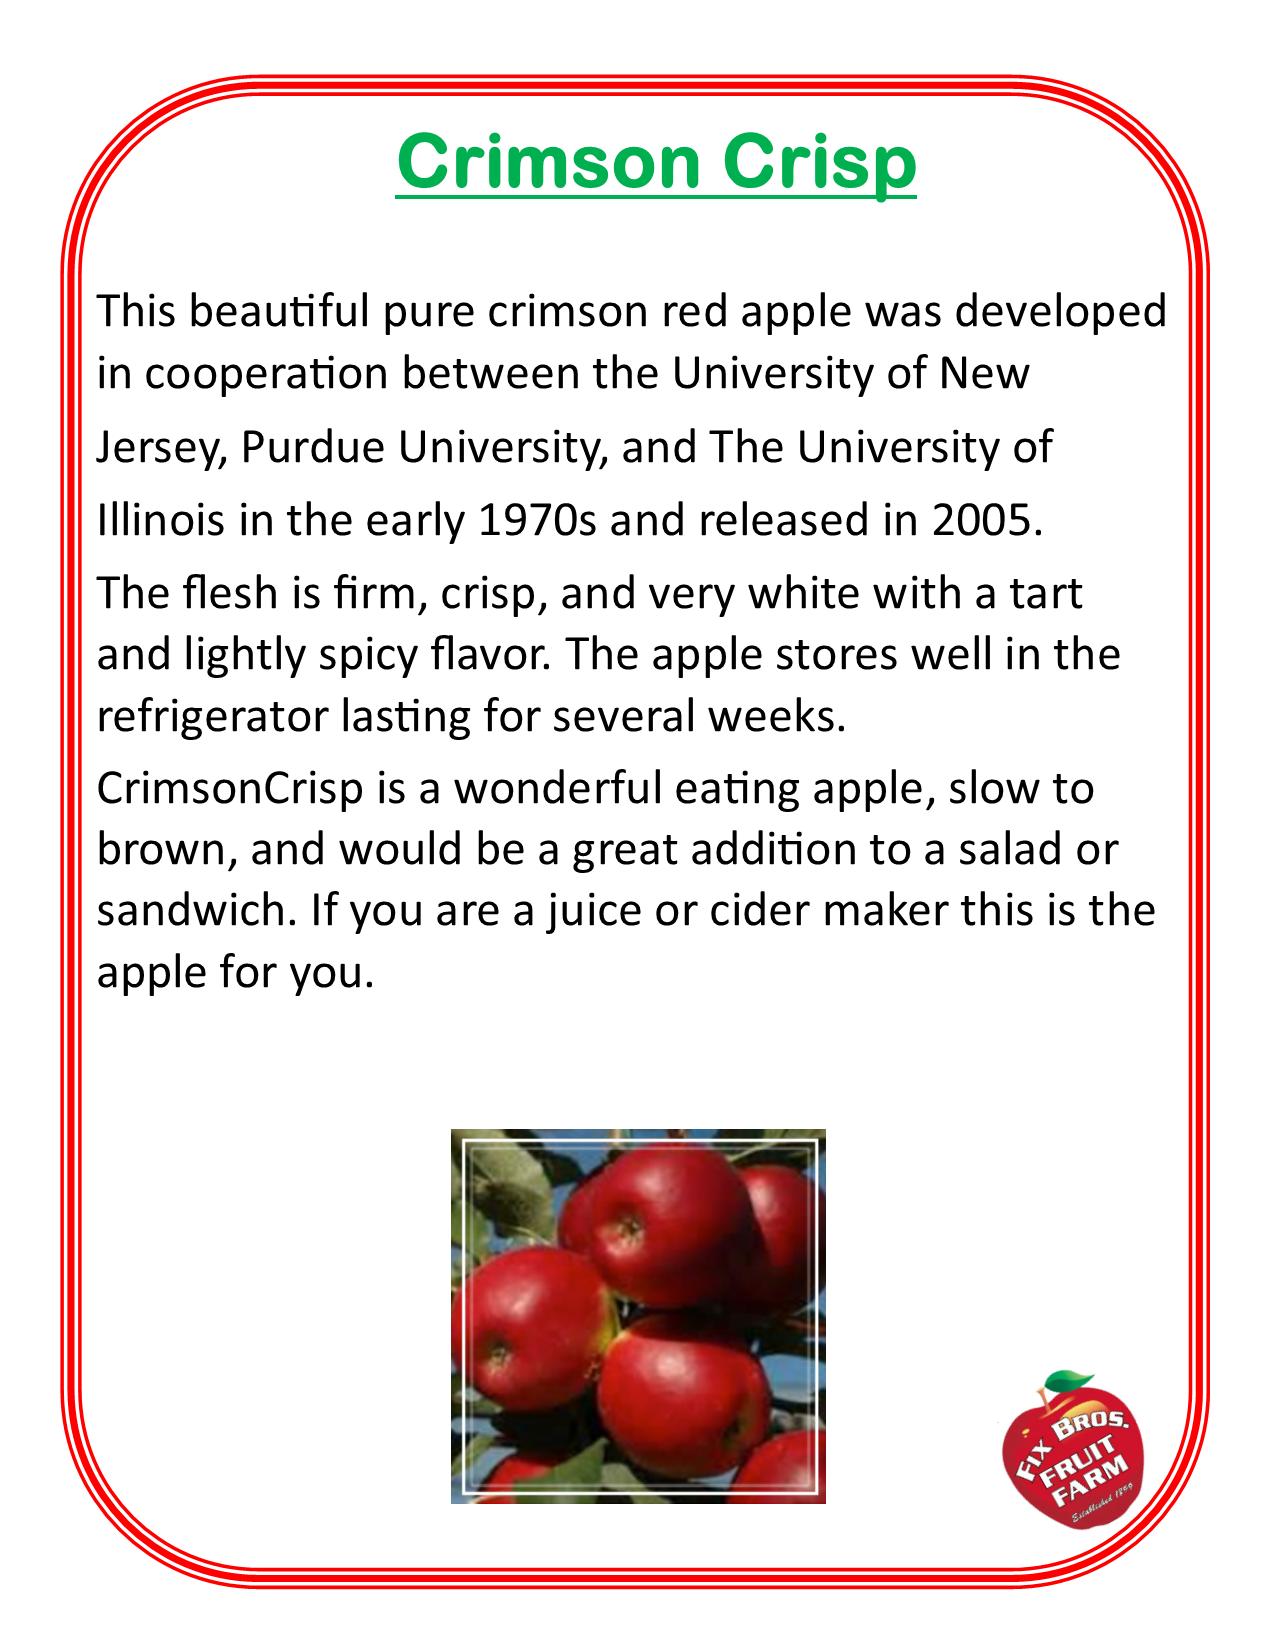 Crimson Crisp Apple description grown at Fix Bros Fruit Farm, Hudson, New York